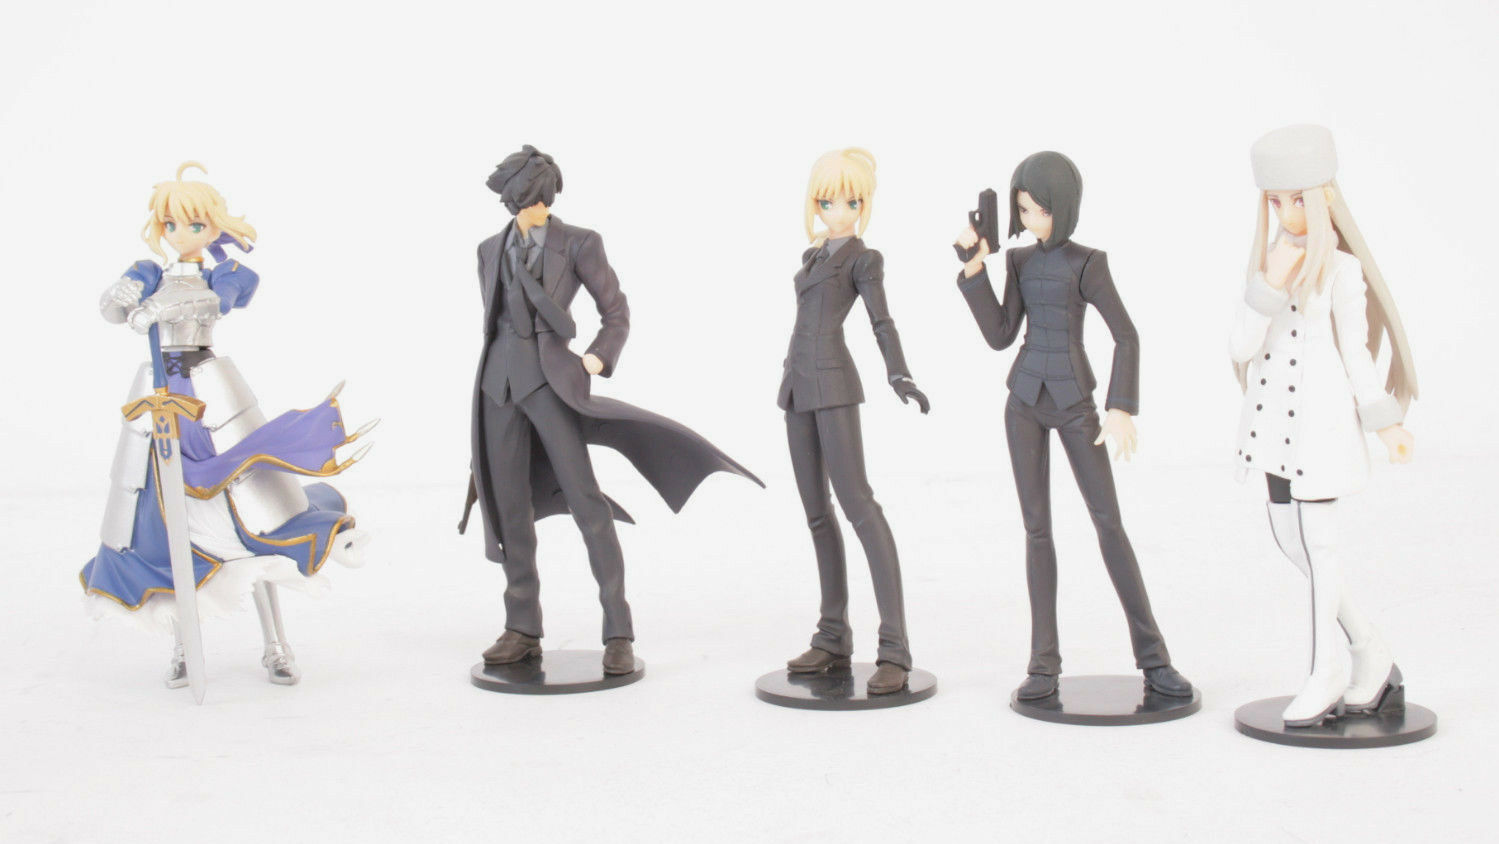 Lot de 20 figurines FATE/ZERO Capsule Q Fraulein Kaiyodo Q-Kyoku figures